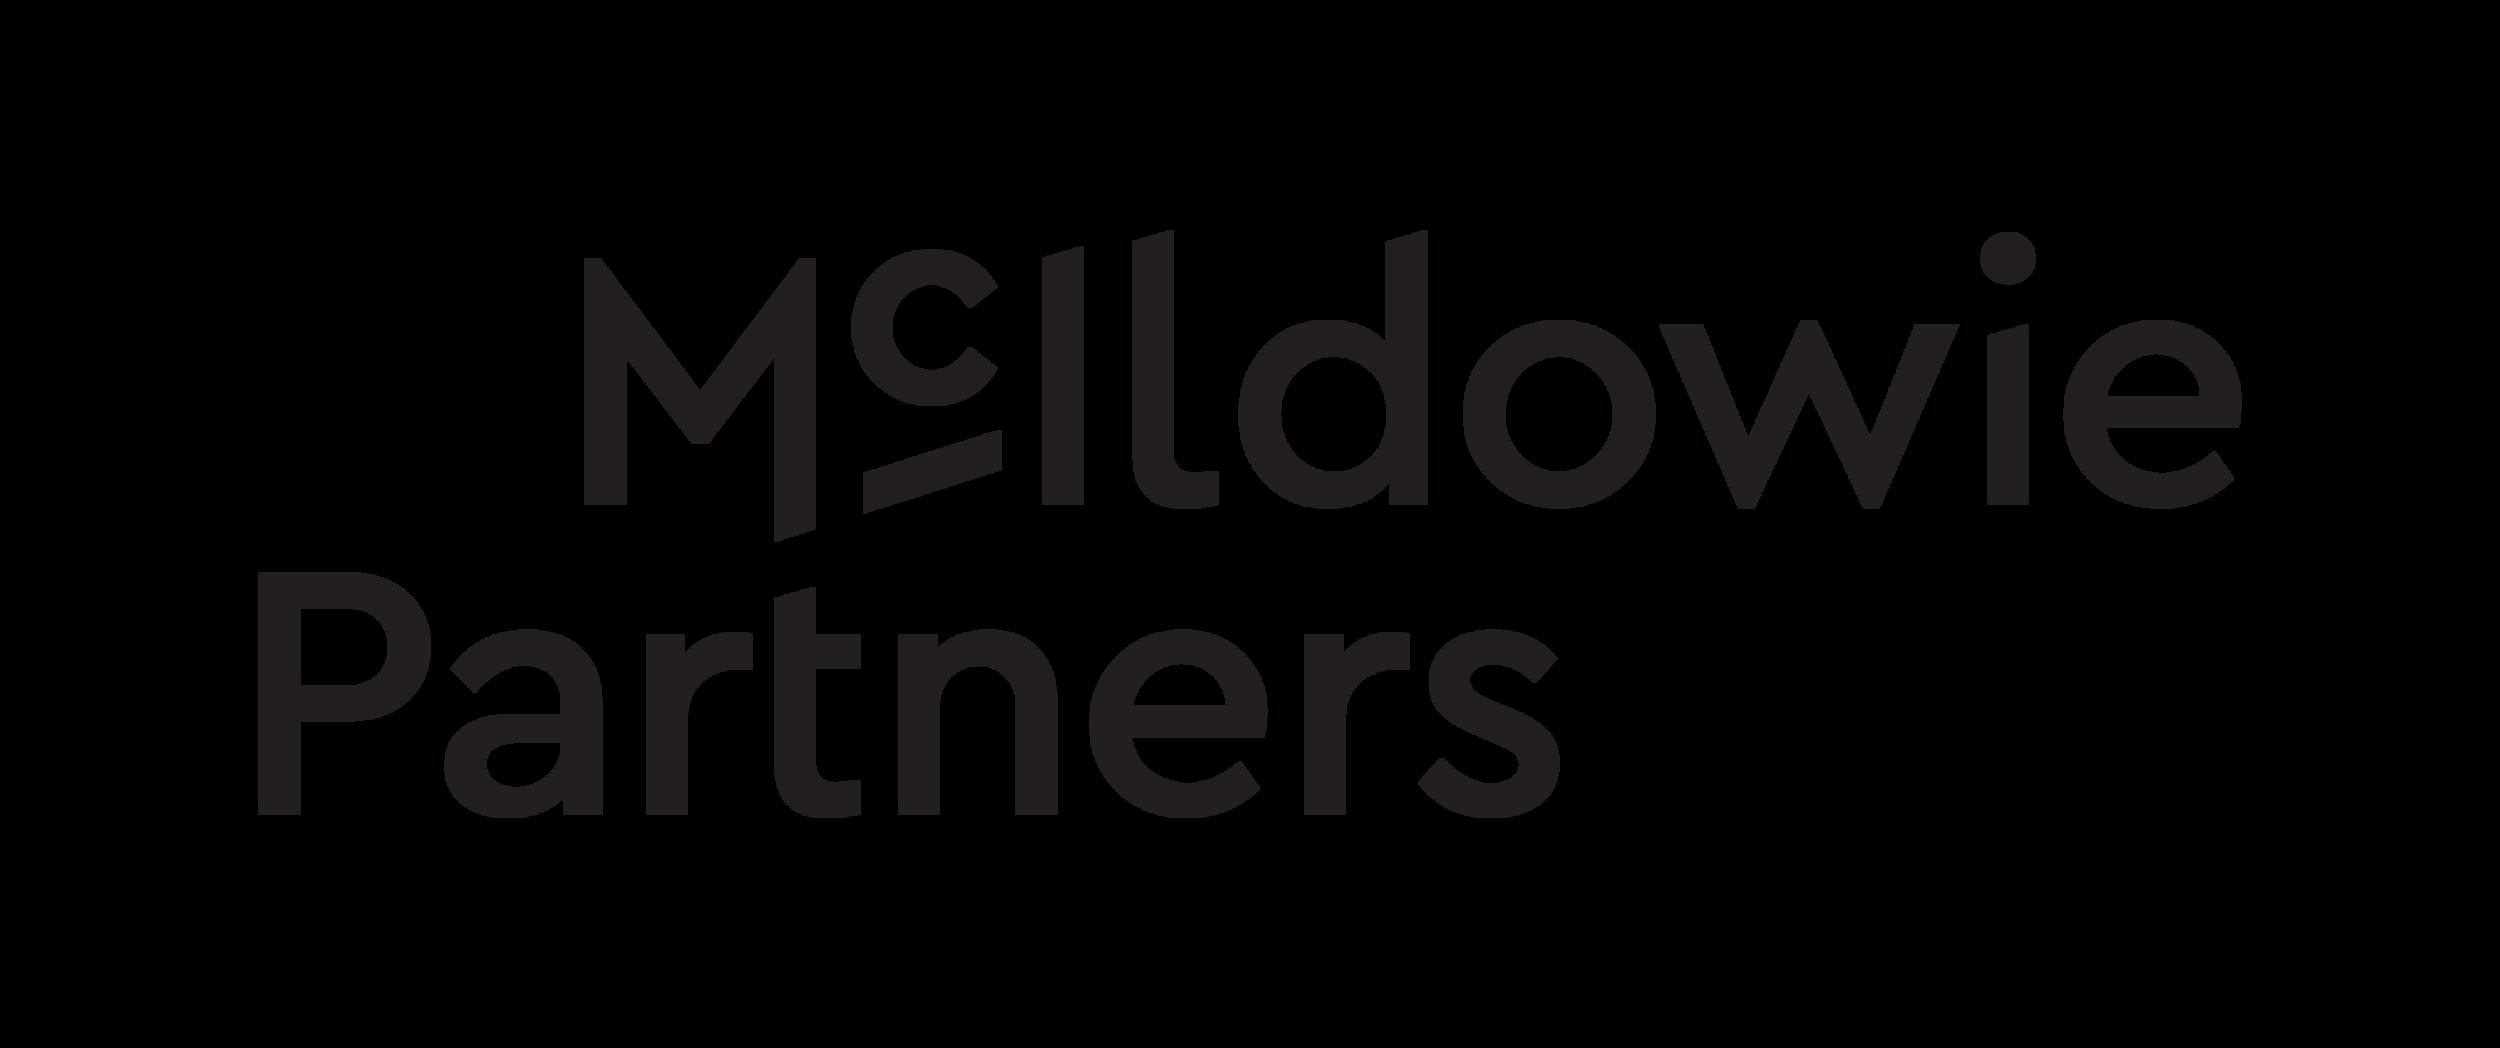 McIldowie-Partners_CMYK.png